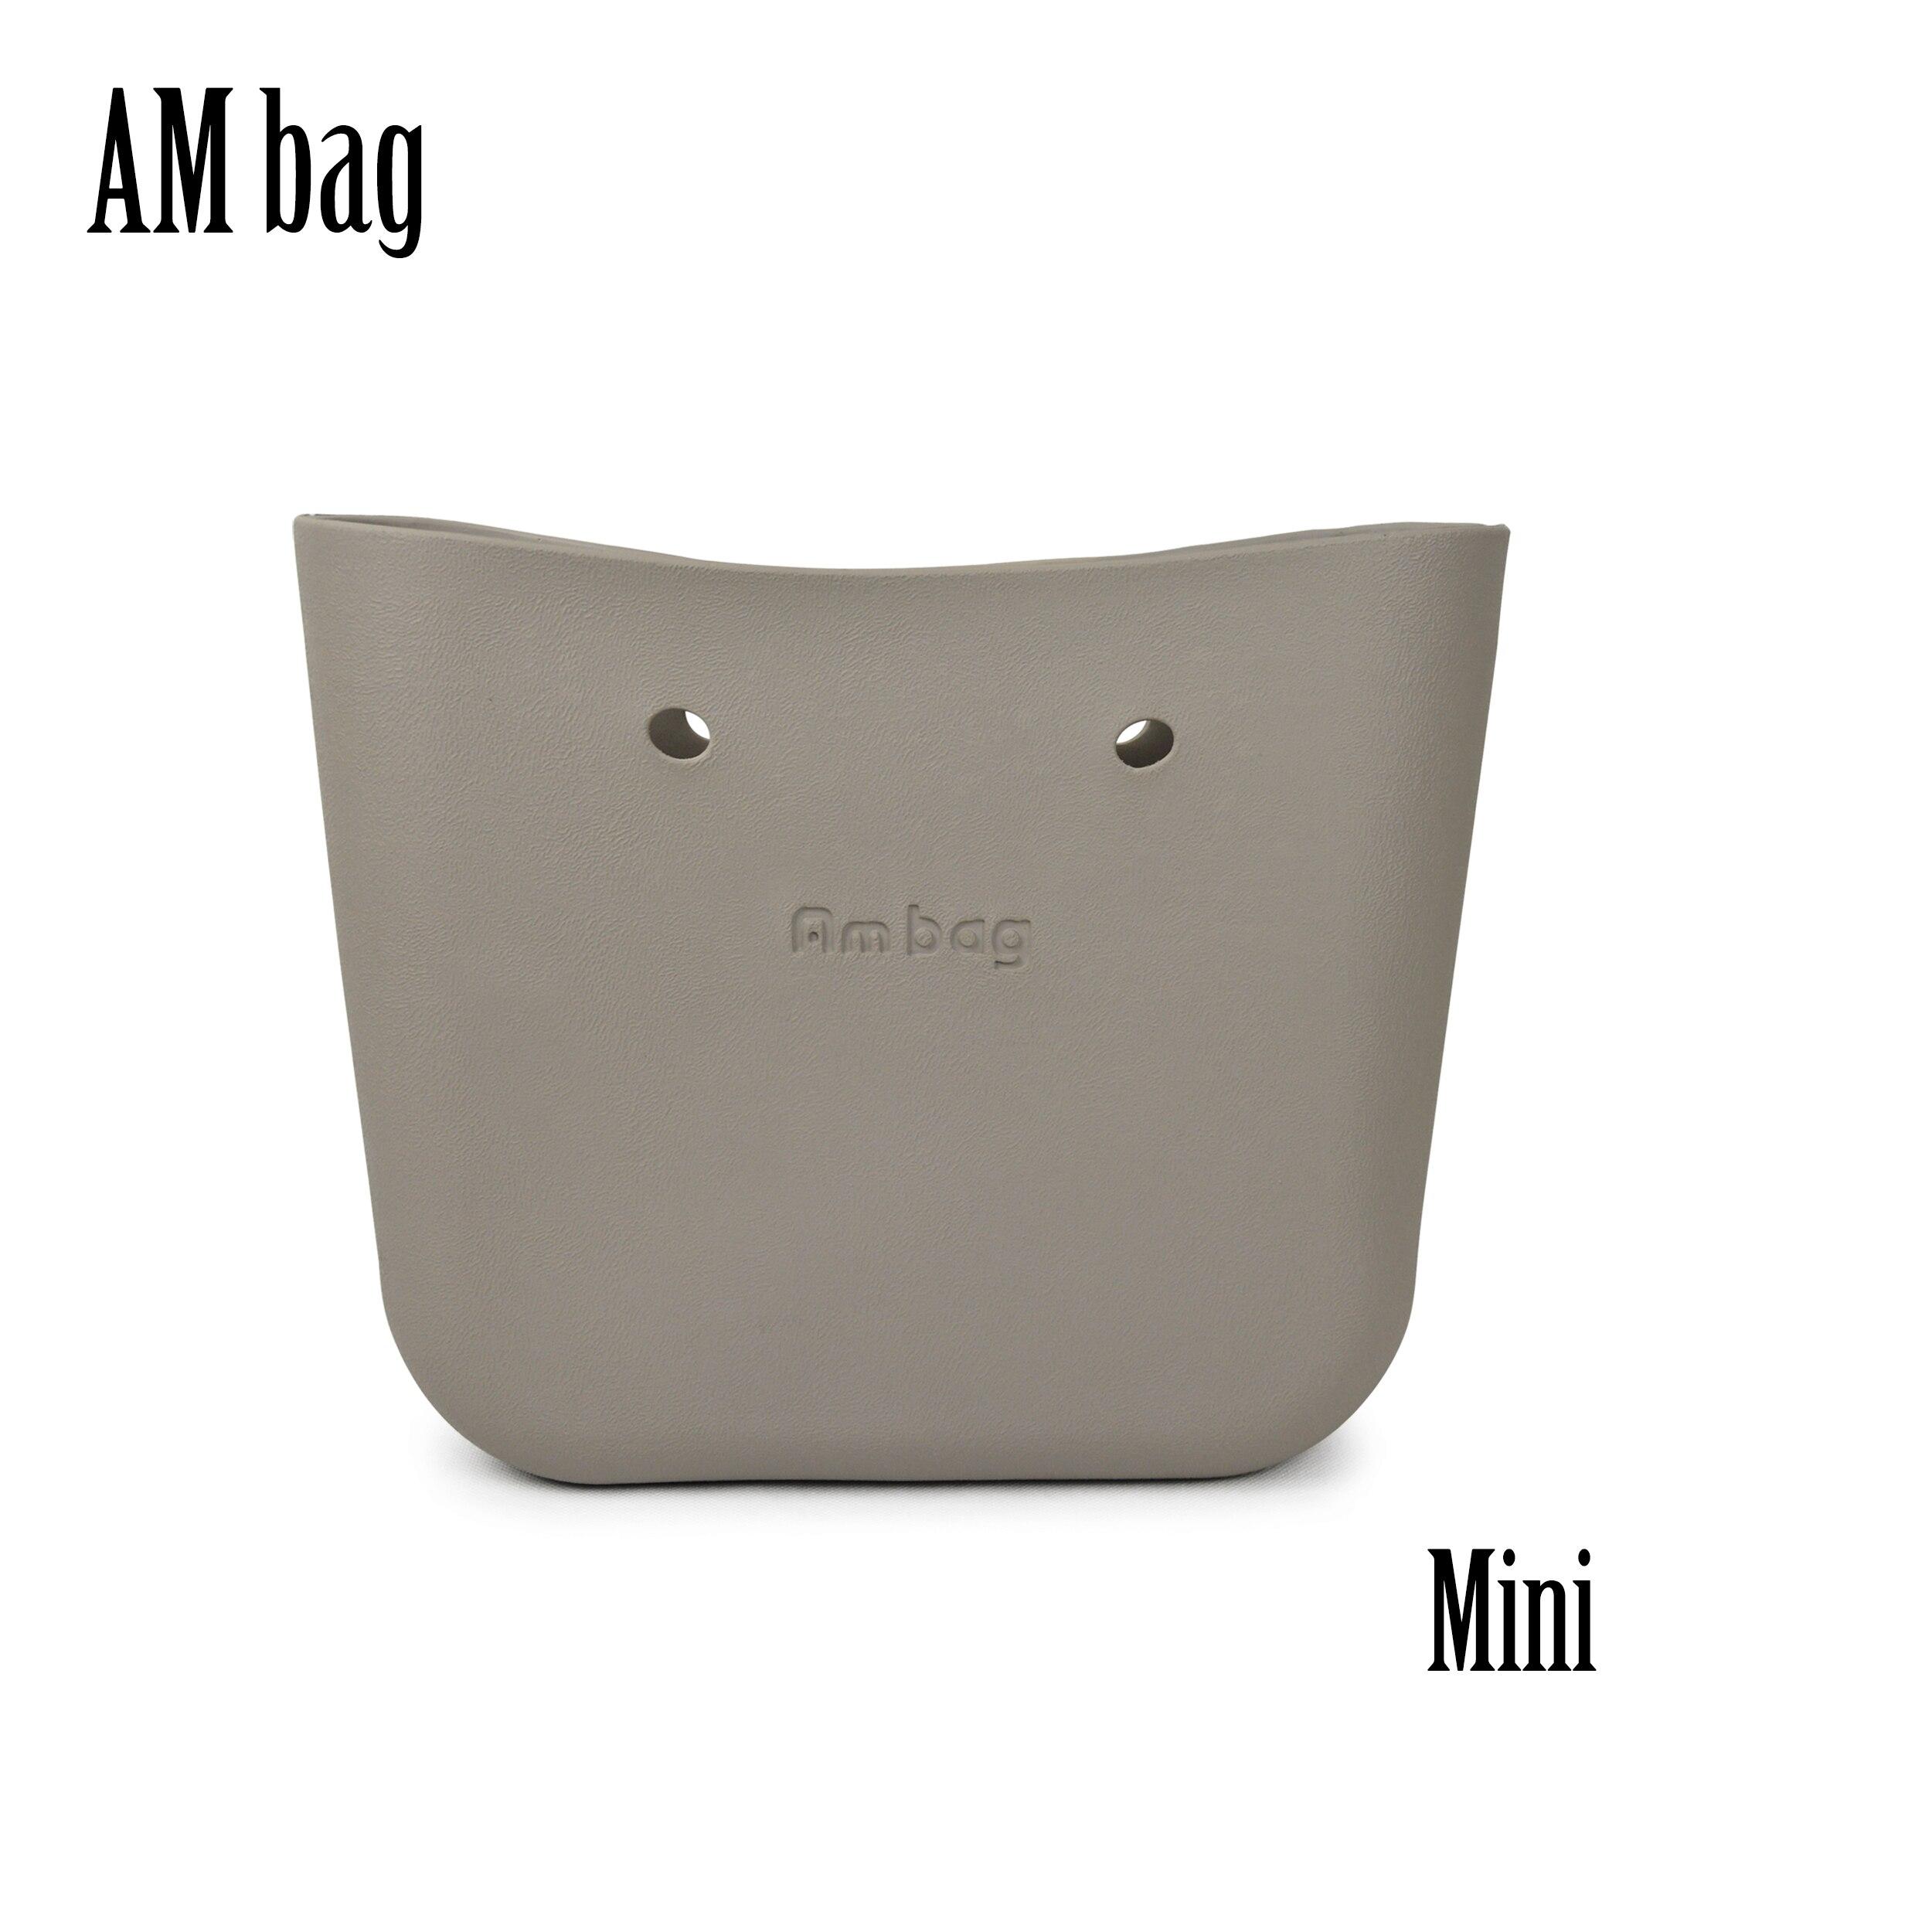 ANLAIBEIER Obag O bag Style Mini Small Ambag Body Waterproof EVA Bag Women s Fashion Handbag